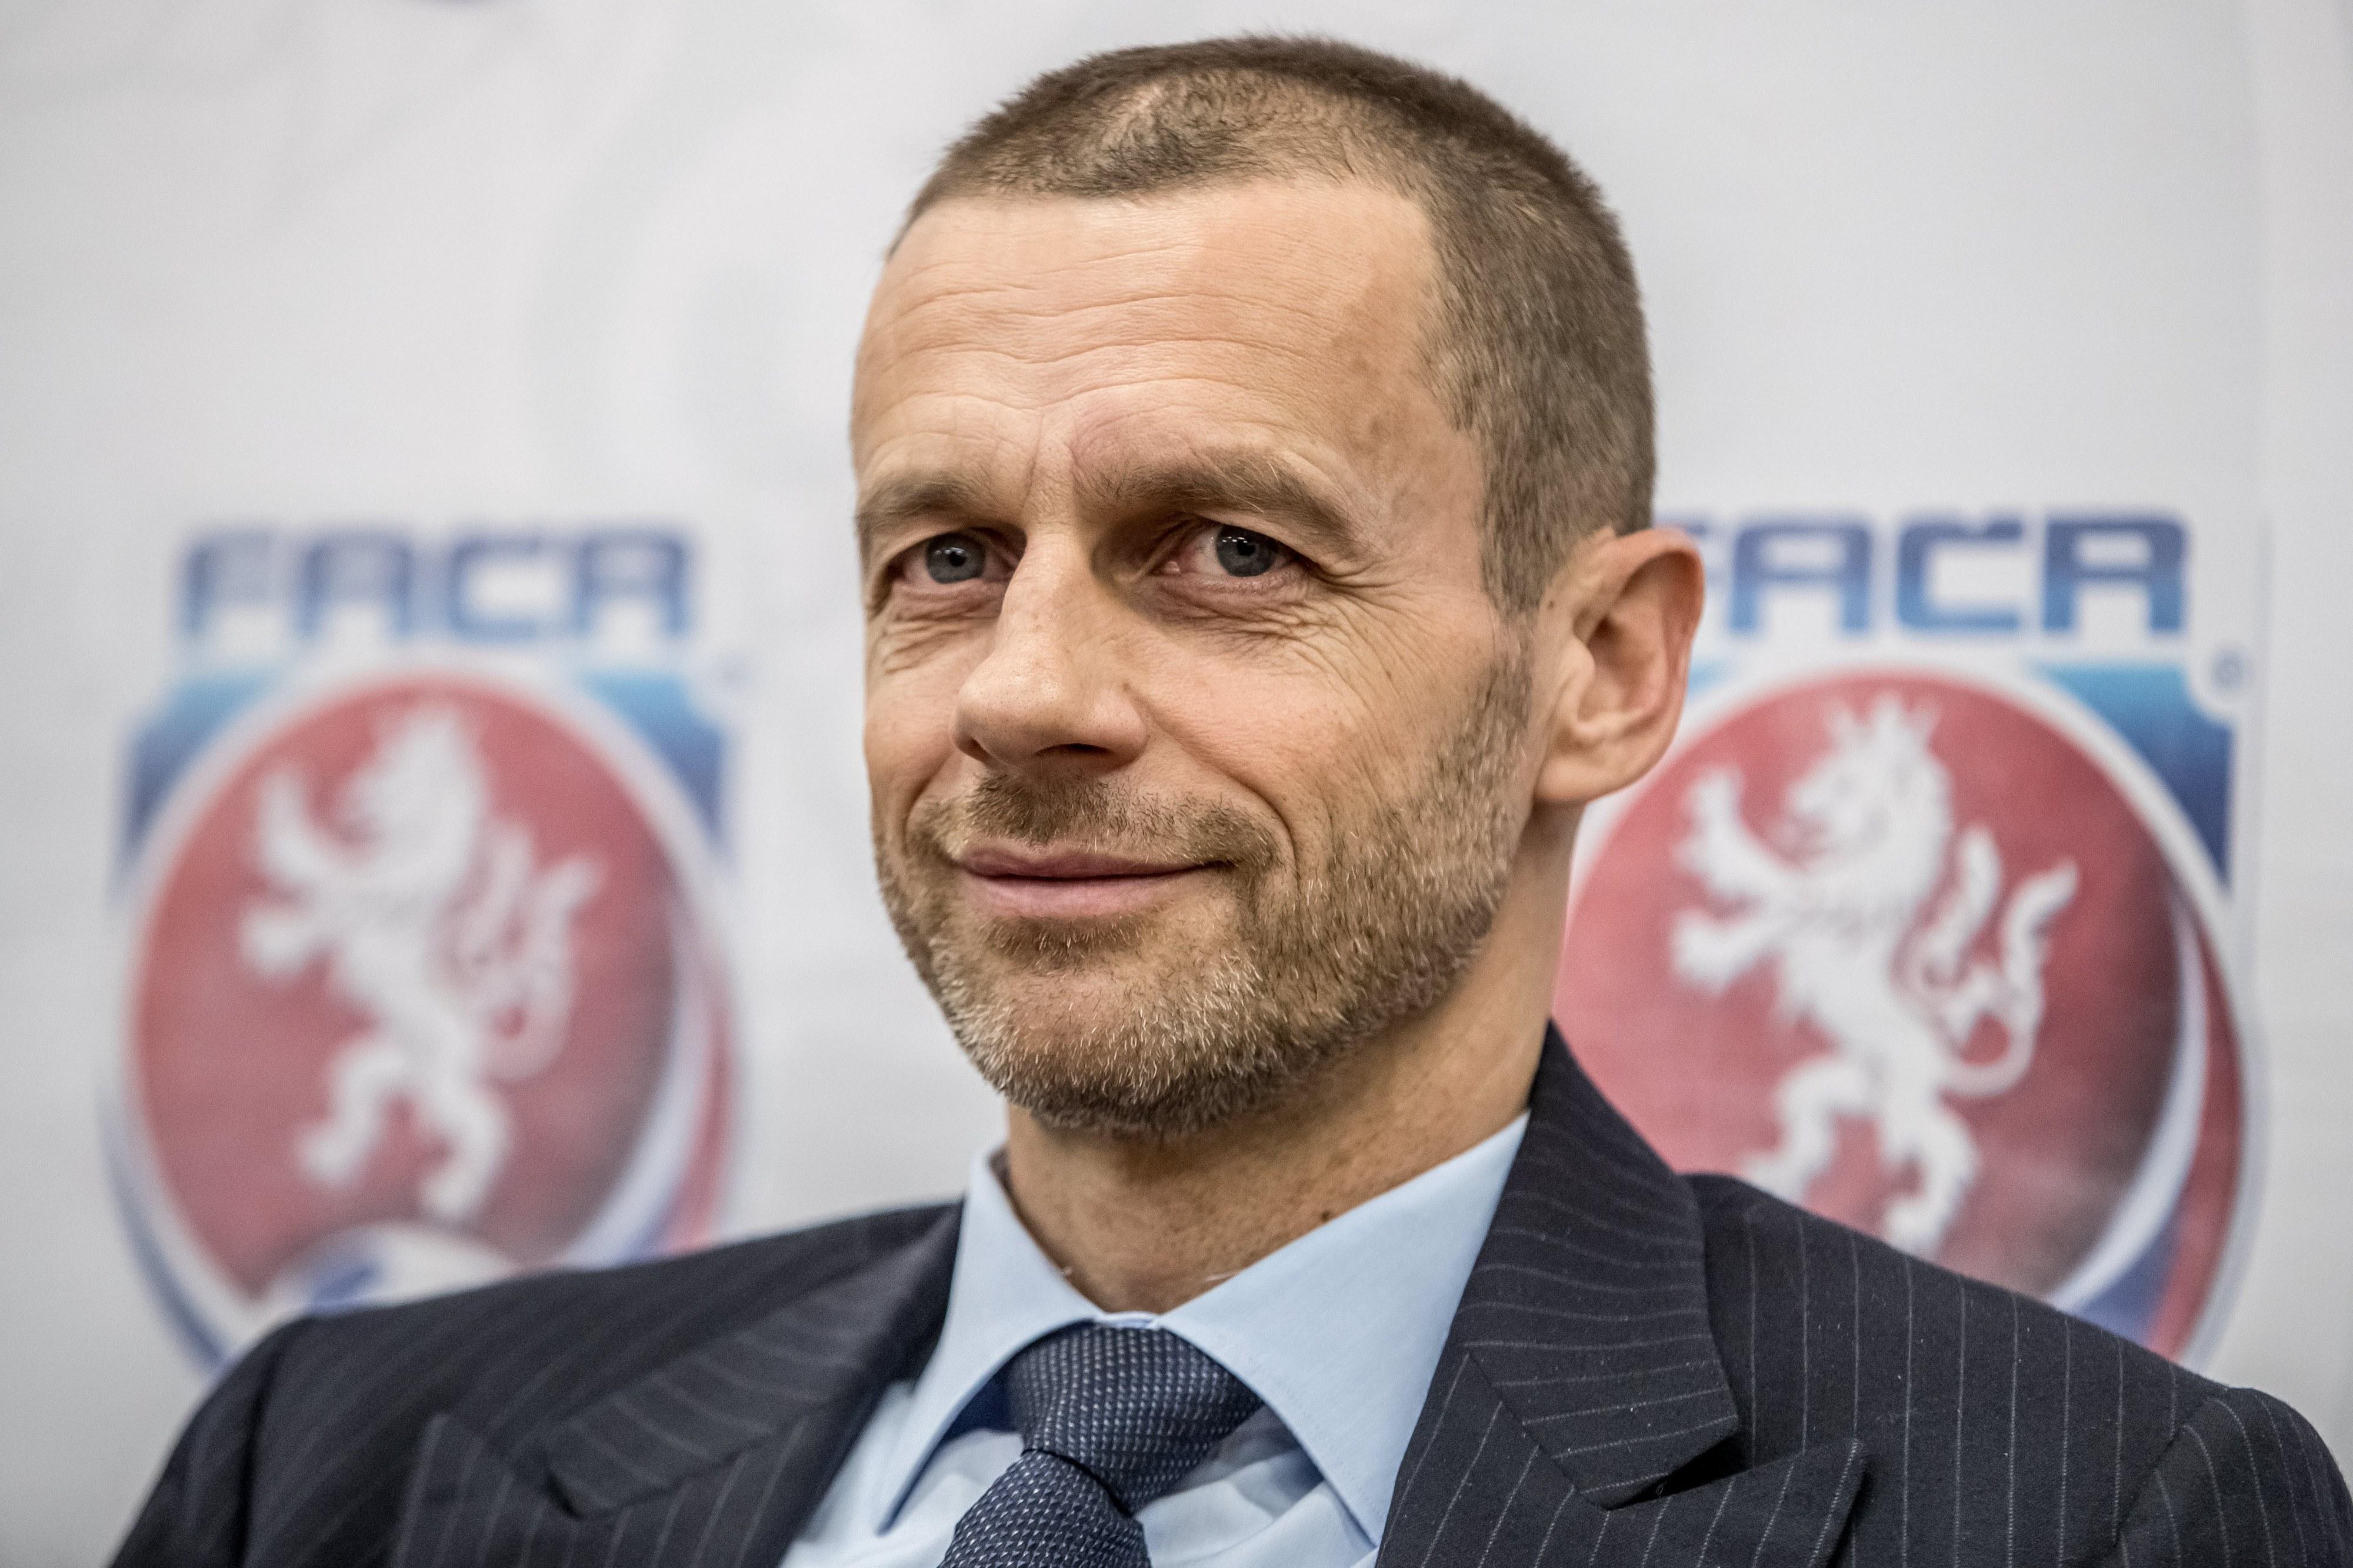 Aleksander Ceferin recandidata-se à presidência da UEFA